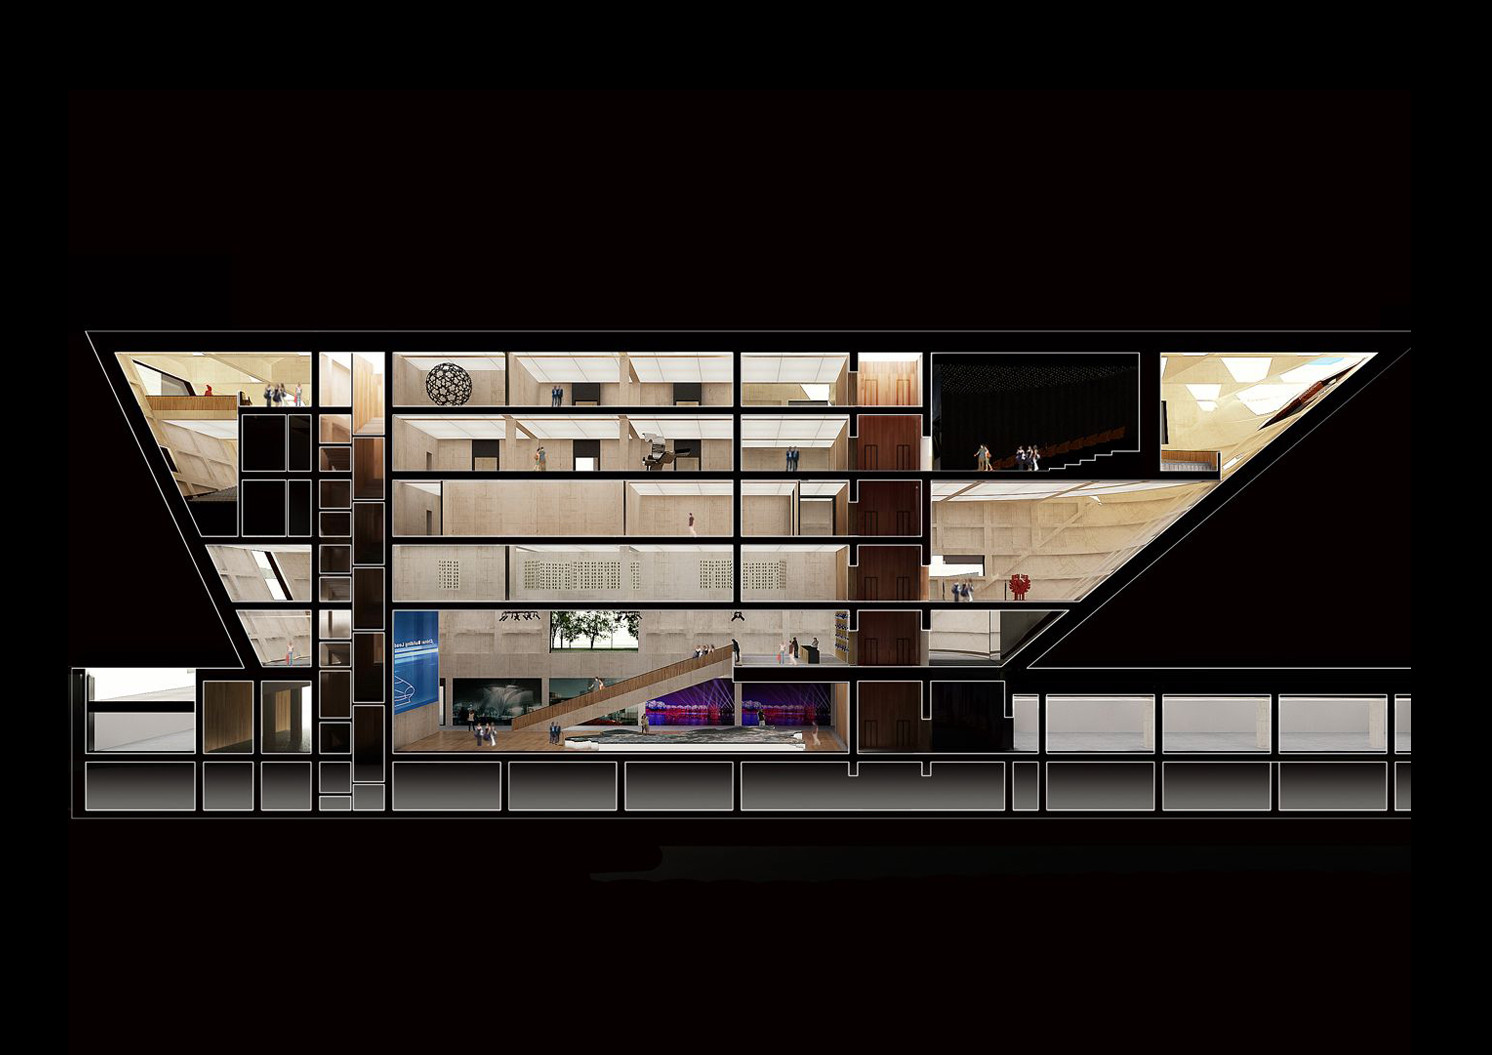 Gallery of Mecanoo Begins Work on Vast Cultural Centre in